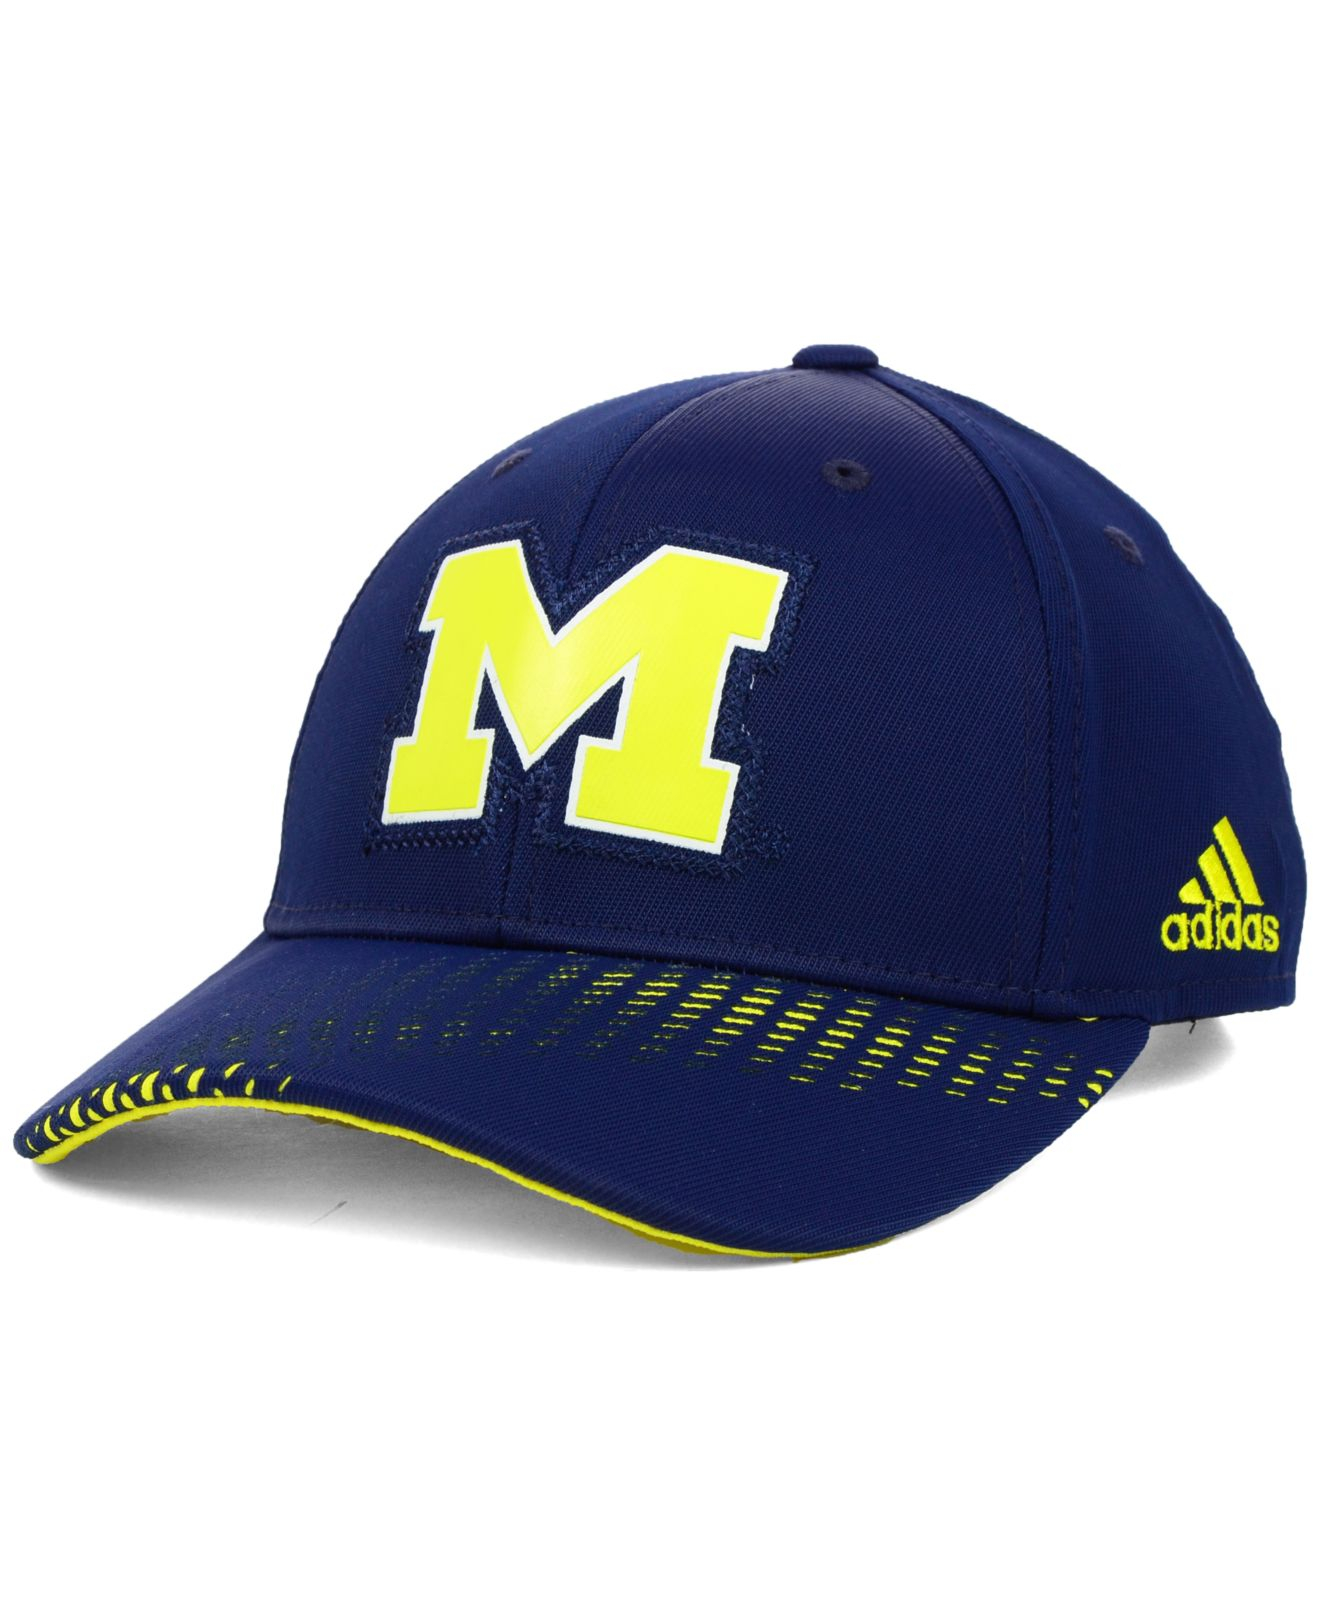 2edc7327550 Lyst - adidas Michigan Wolverines Ncaa Adjustable Cap in Blue for Men